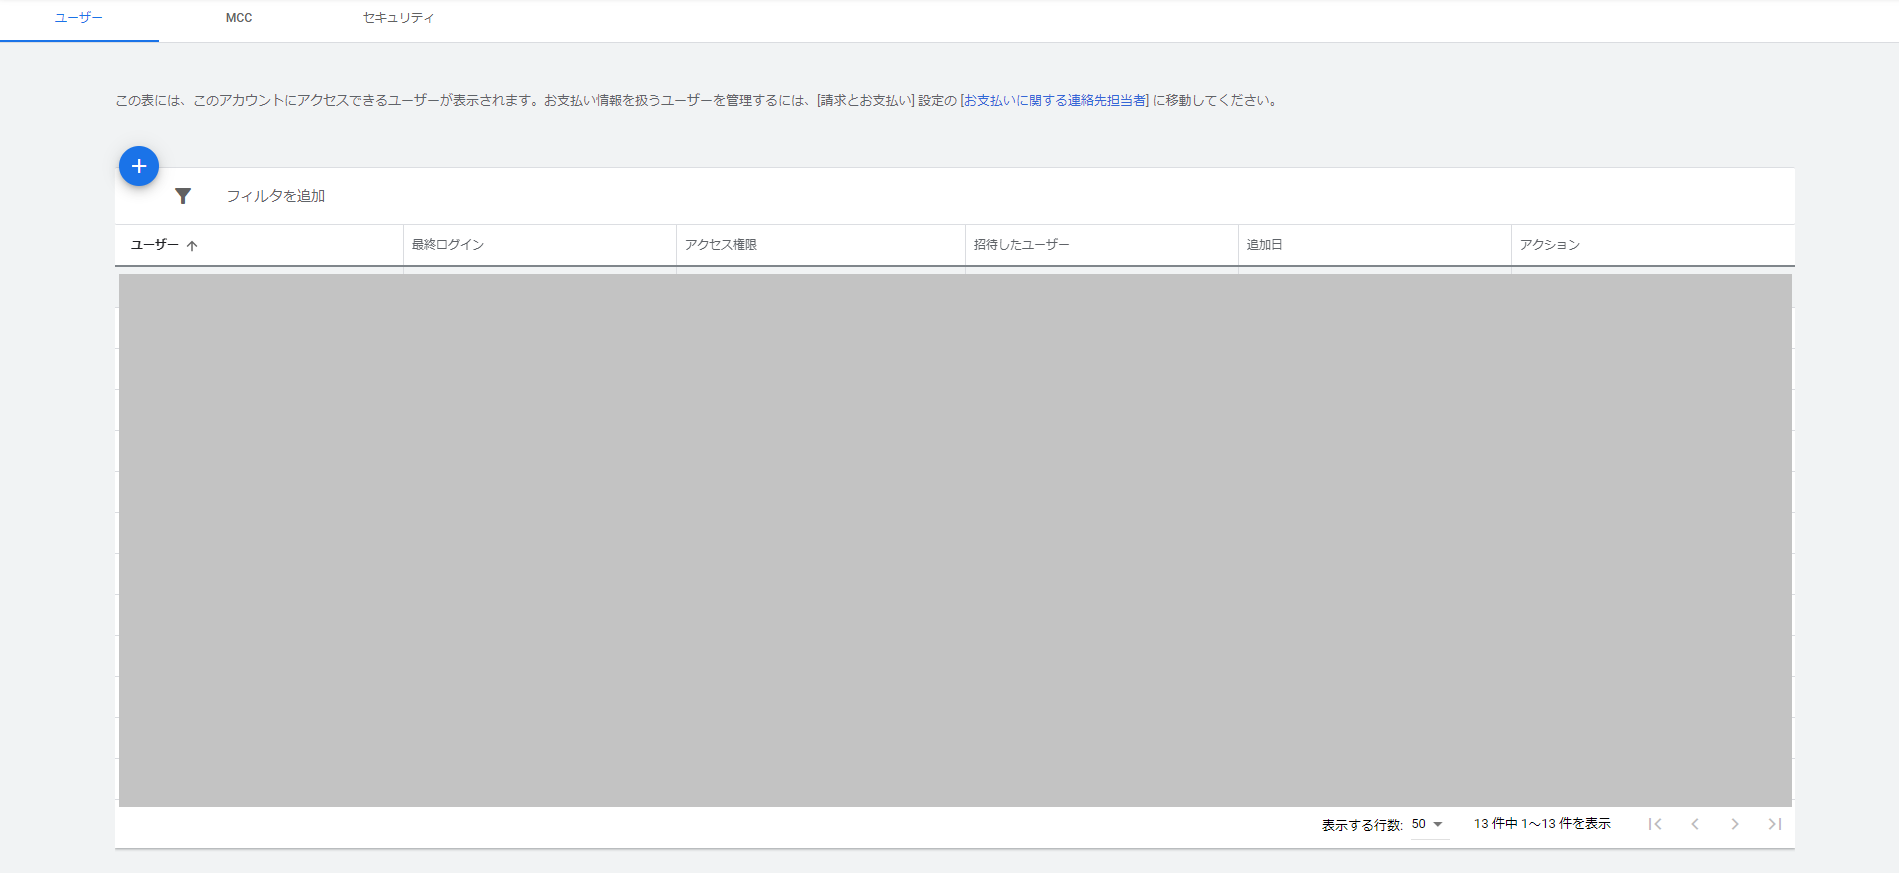 Google広告のユーザー招待